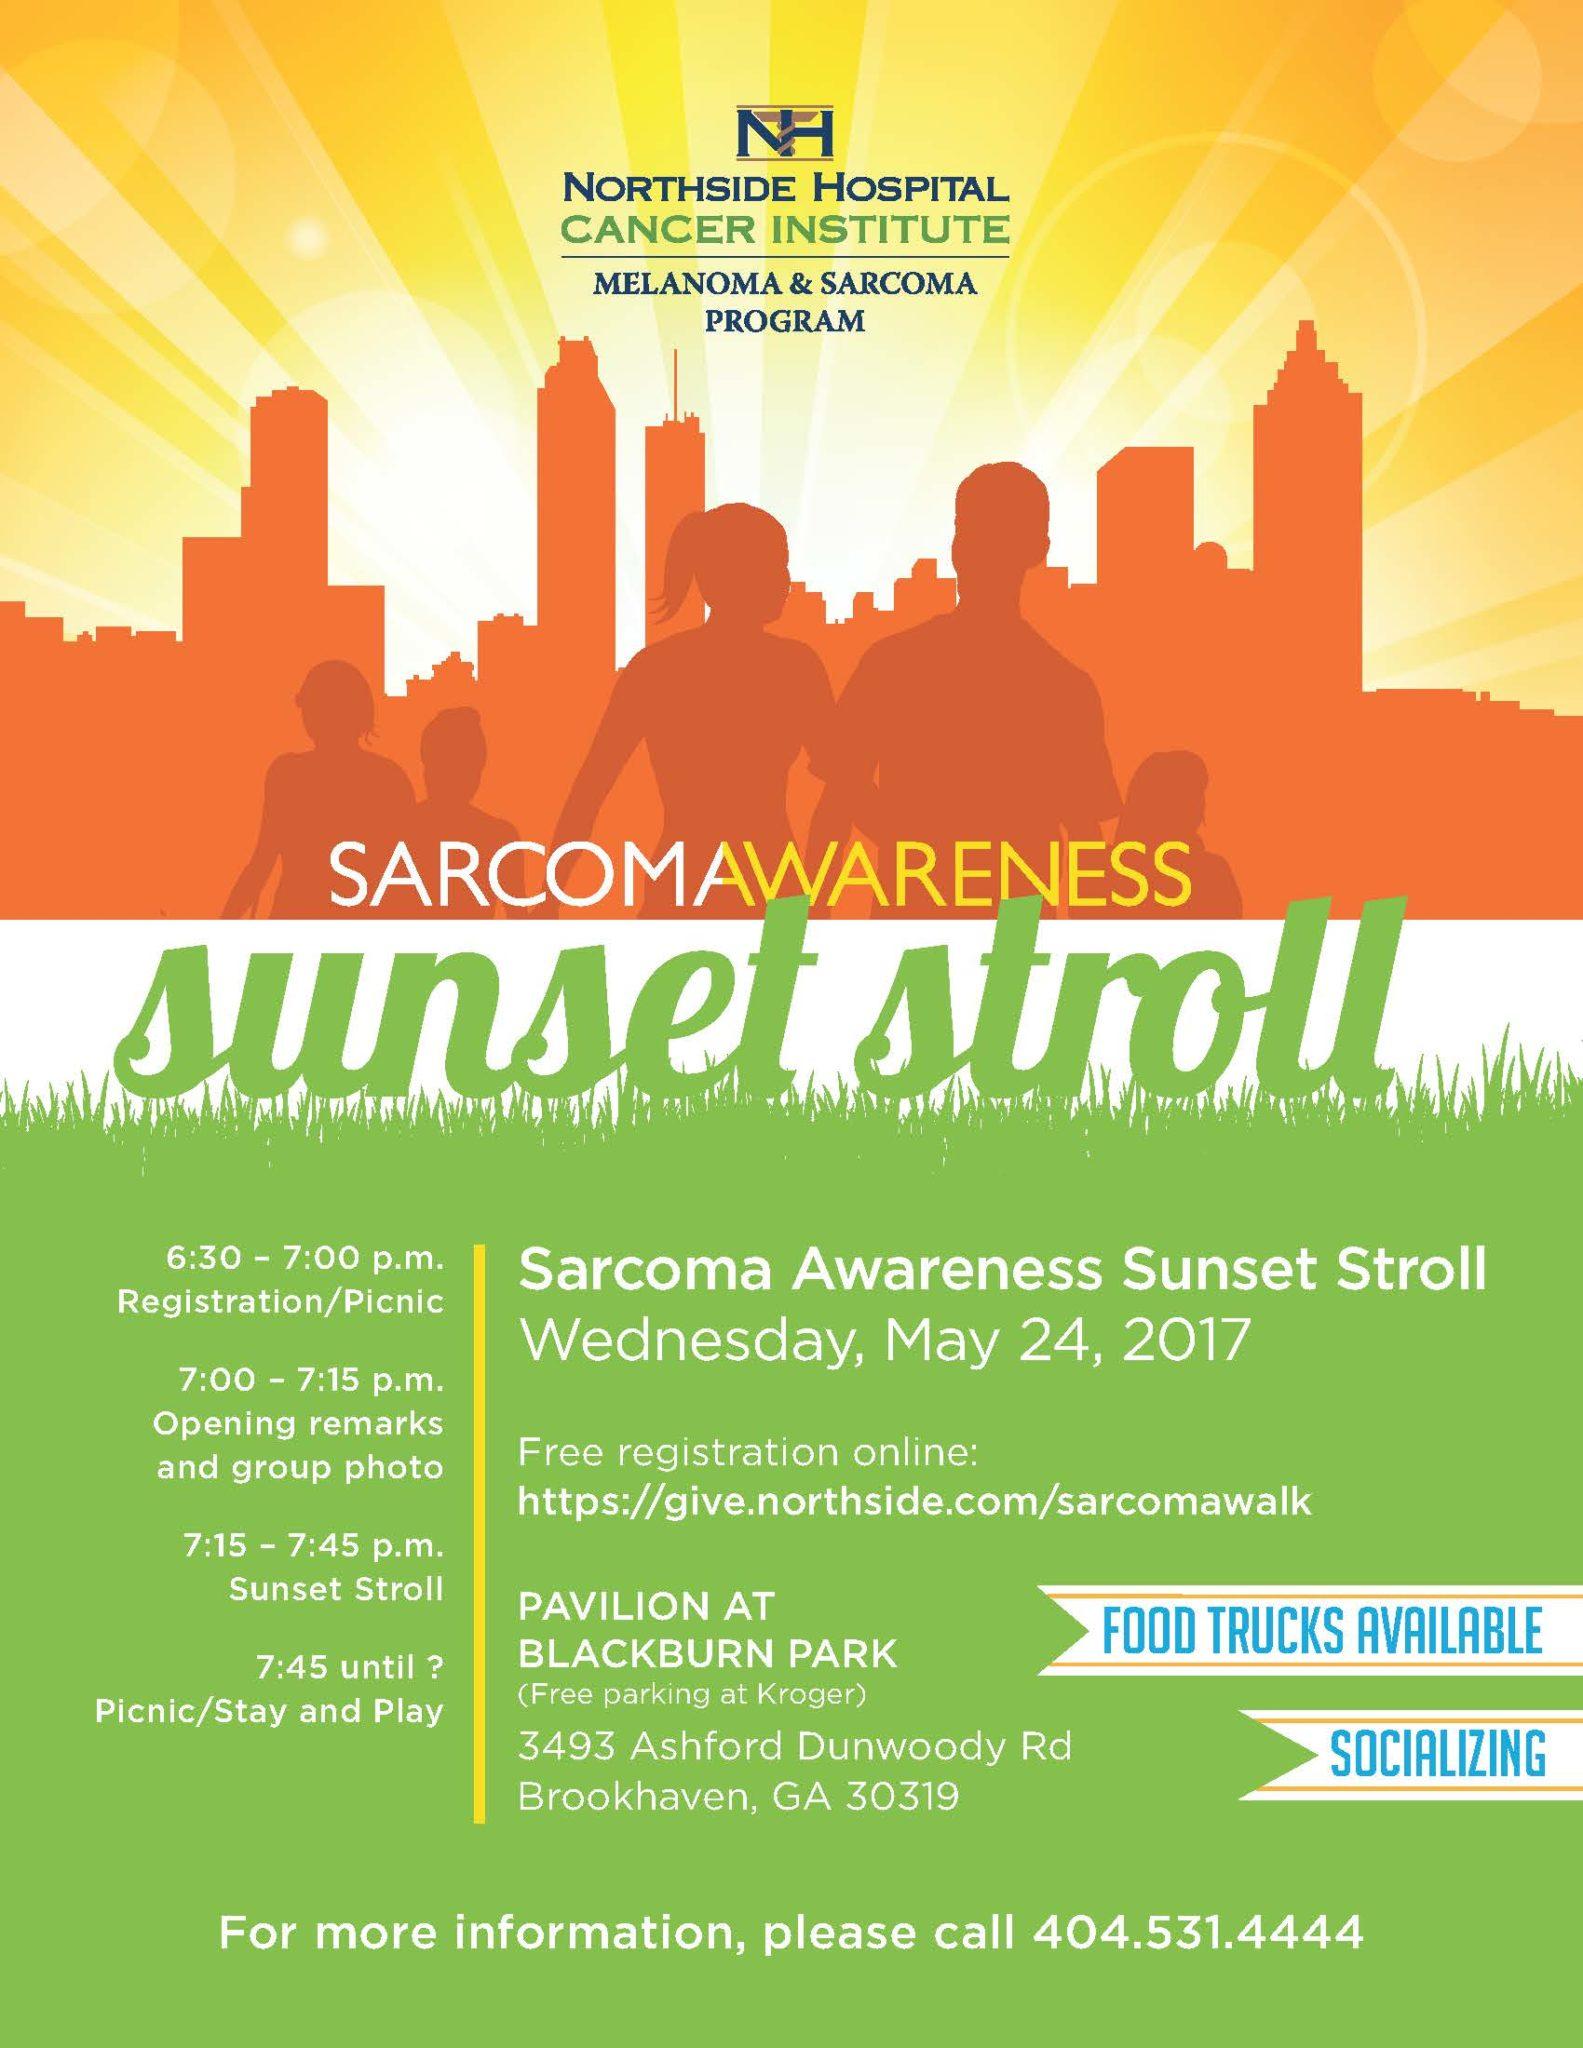 Sarcoma Awareness Sunset Stroll